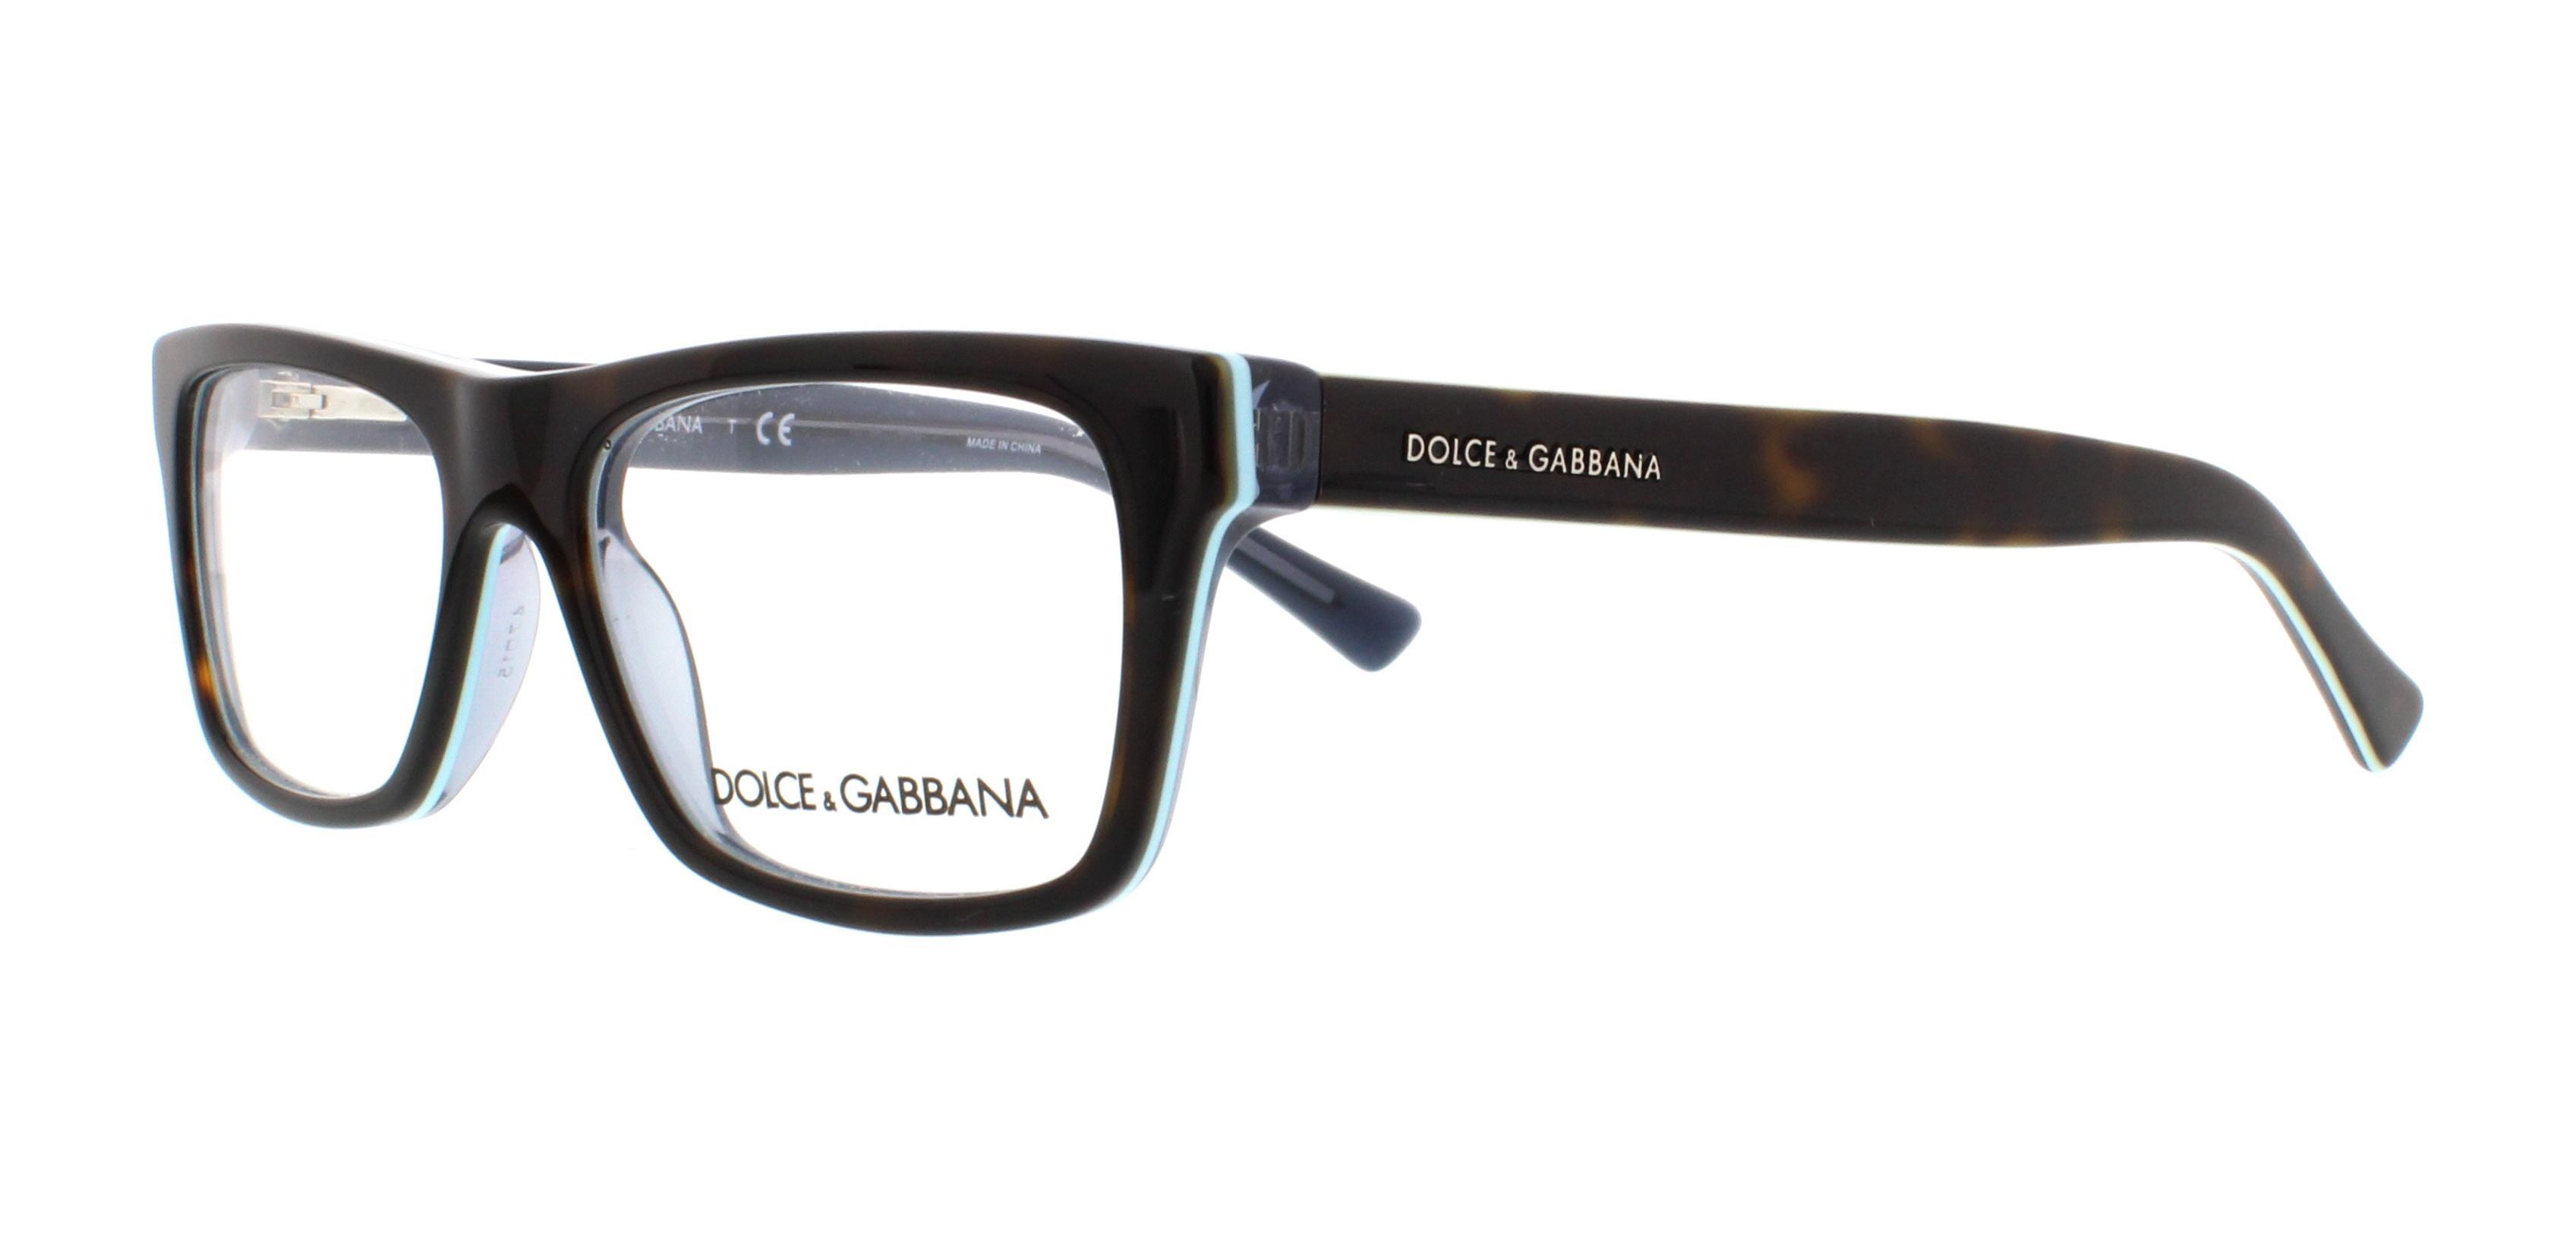 2867 havana on petroleum - Dolce And Gabbana Glasses Frames